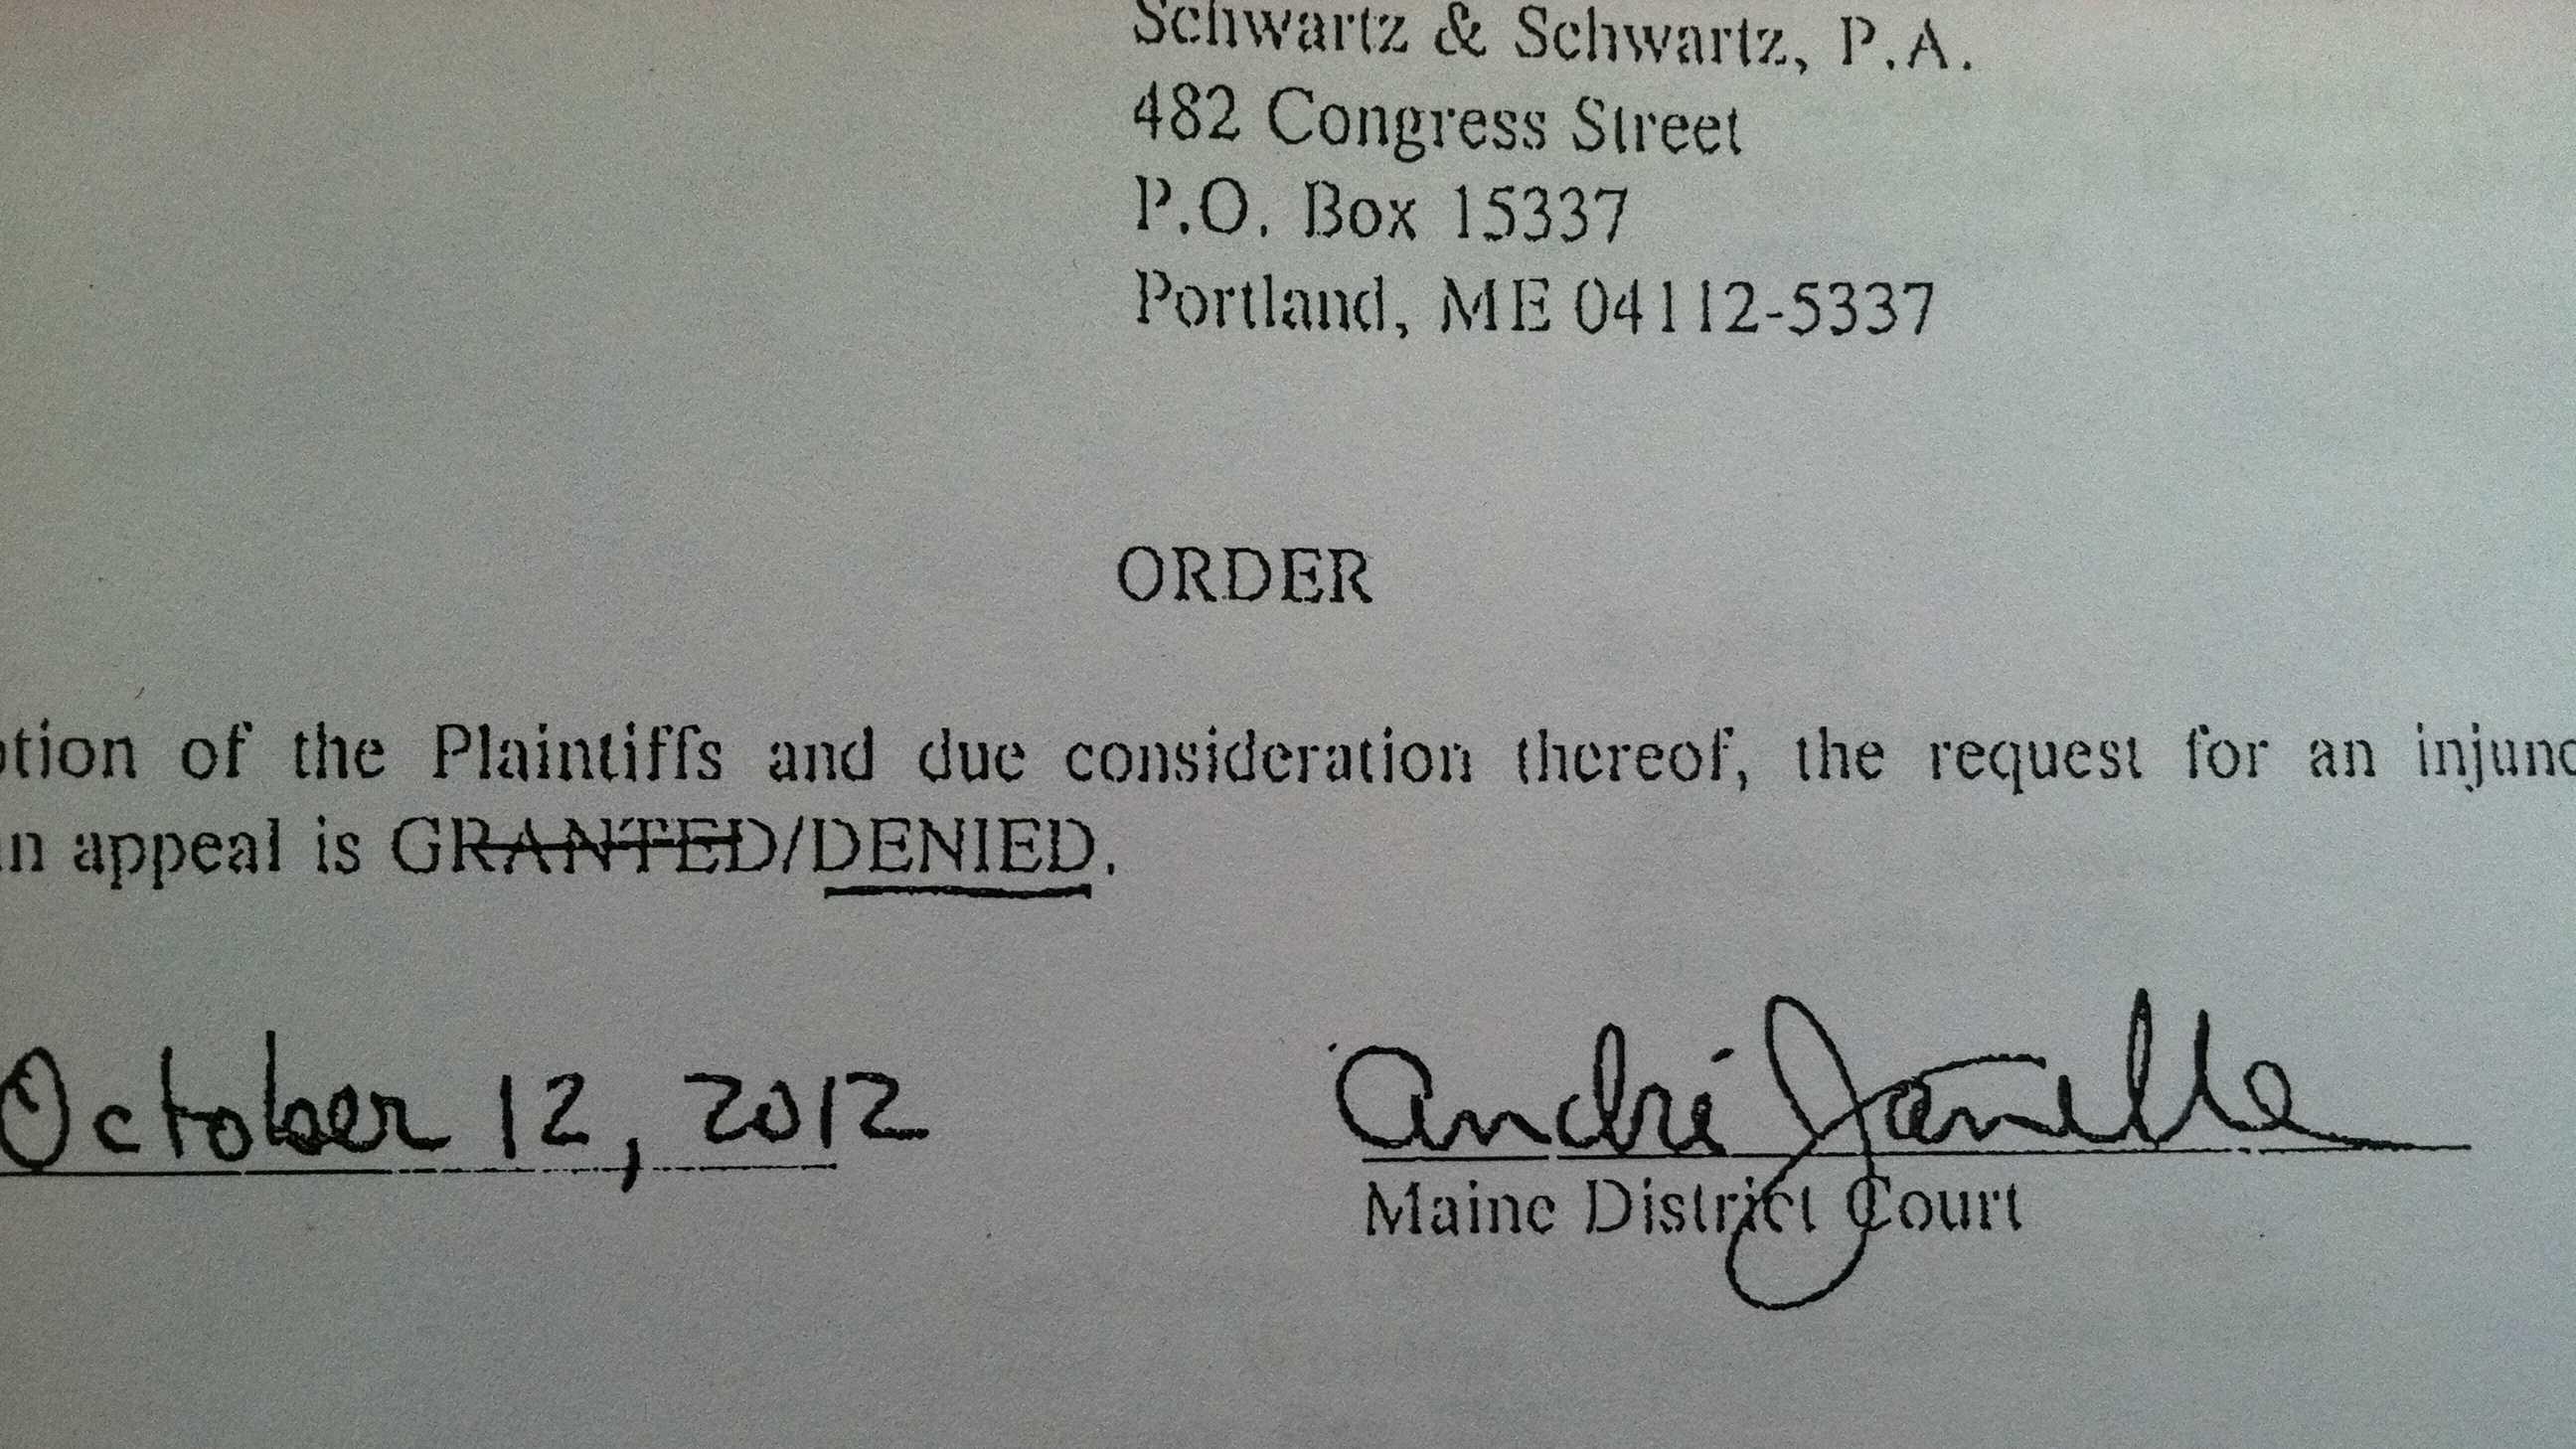 Prostitution appeal denied